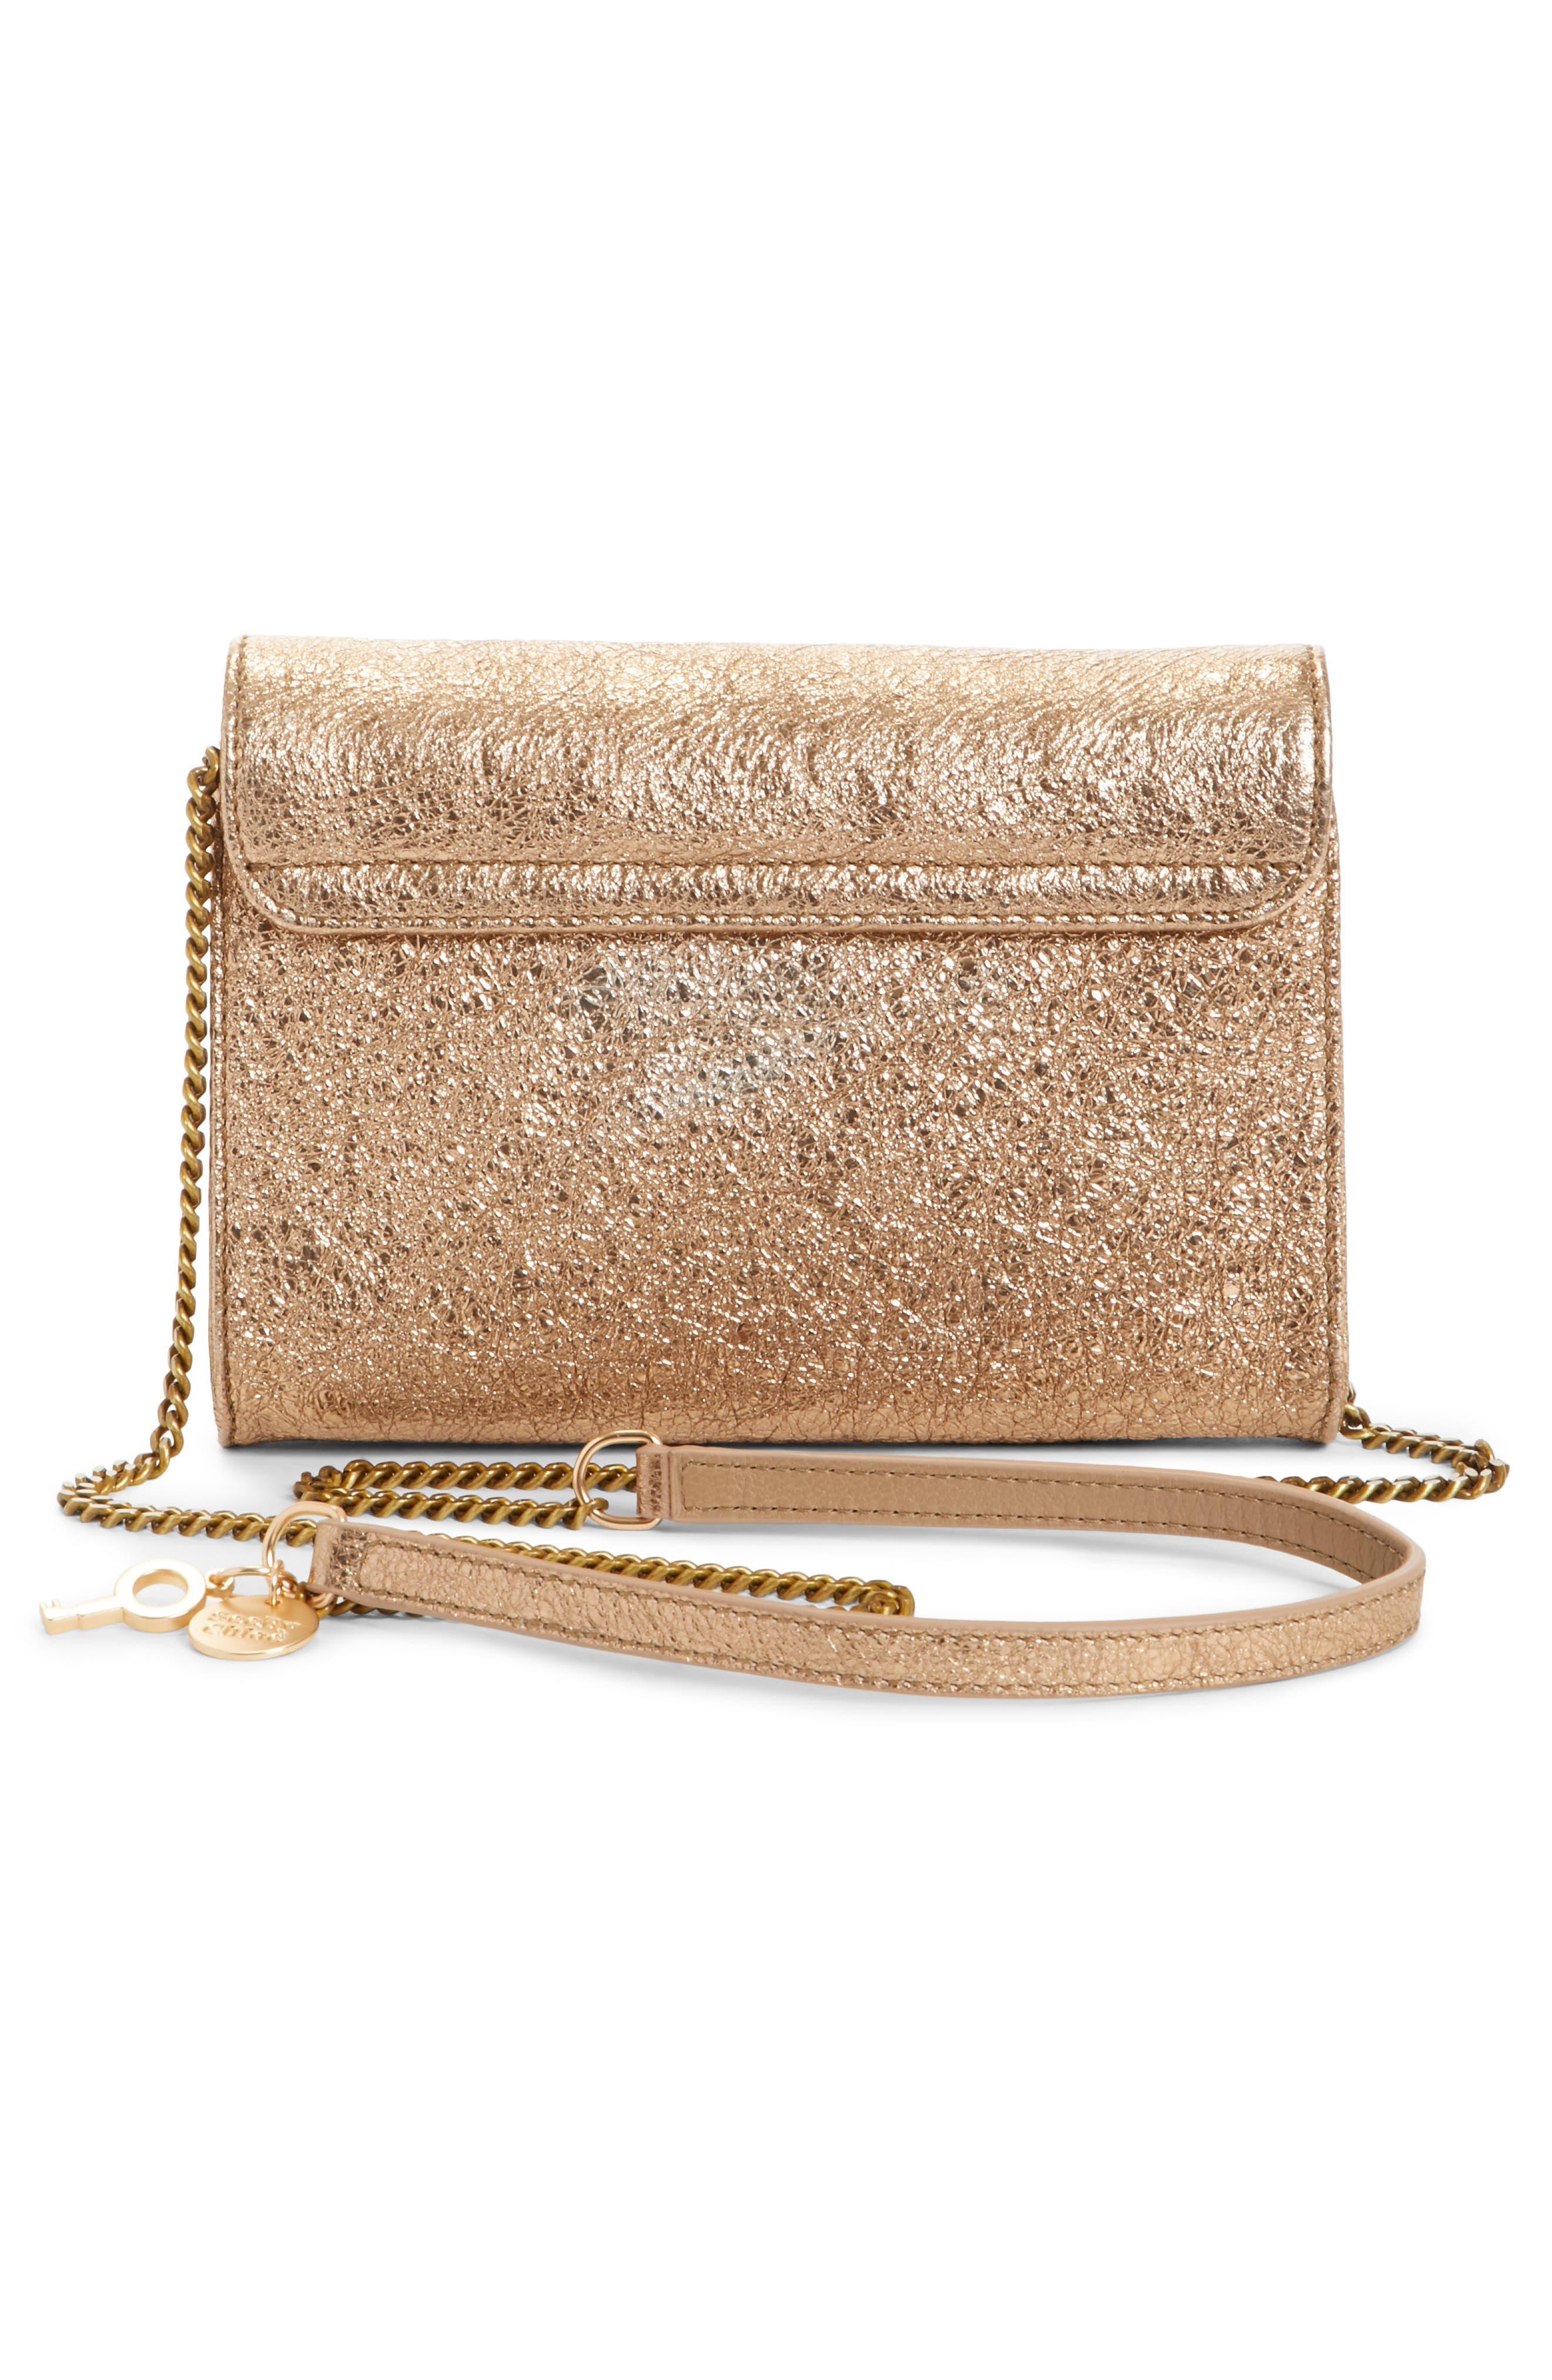 Mini Lois Metallic Calfskin Leather Crossbody Bag,                             Alternate thumbnail 3, color,                             SANDY BROWN